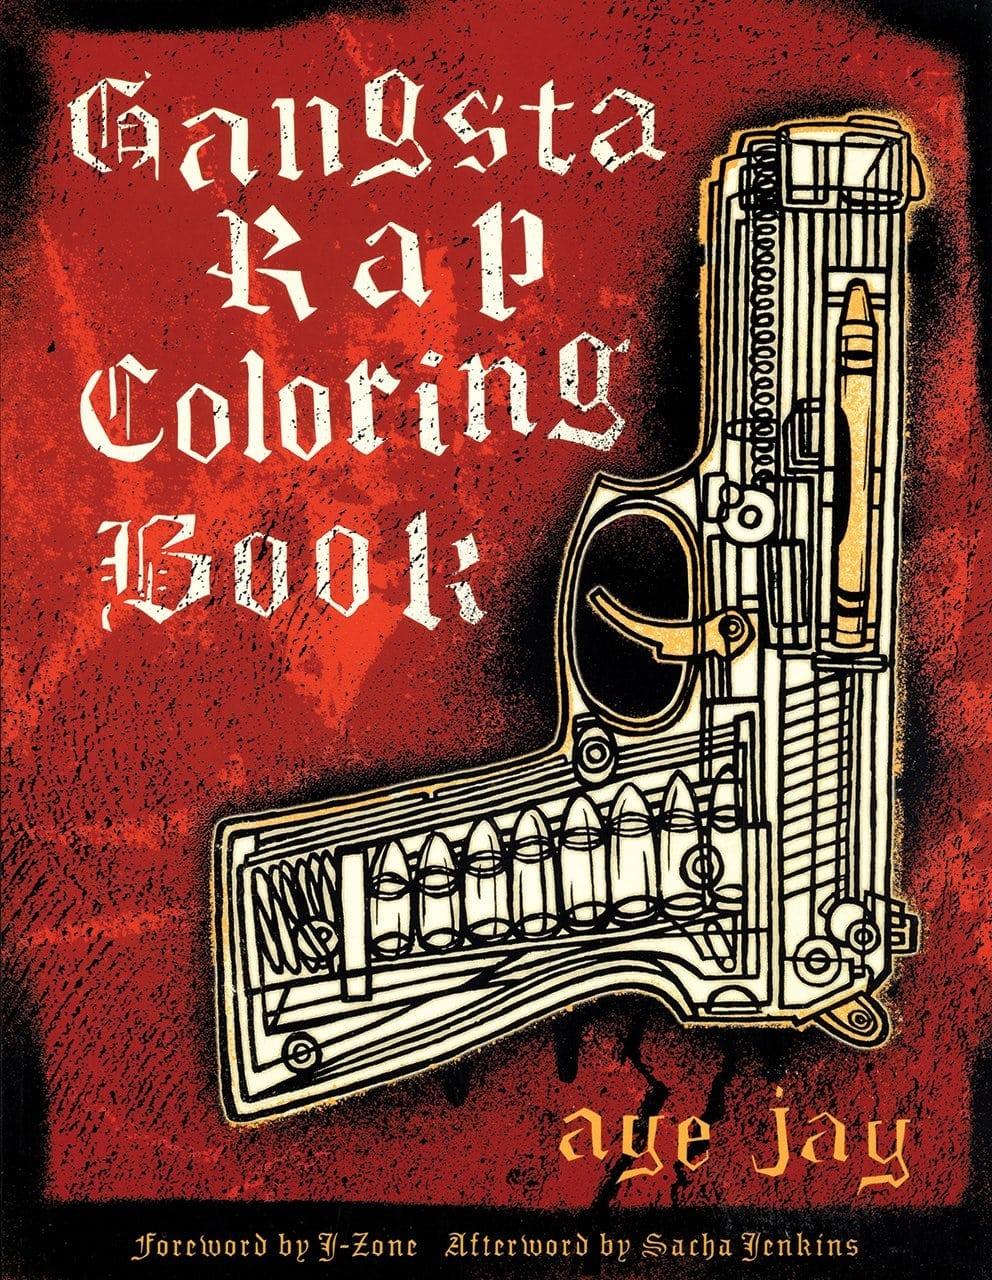 Gangsta Rap Coloring Book  Anthony Aye Jay Morano  9780867196047